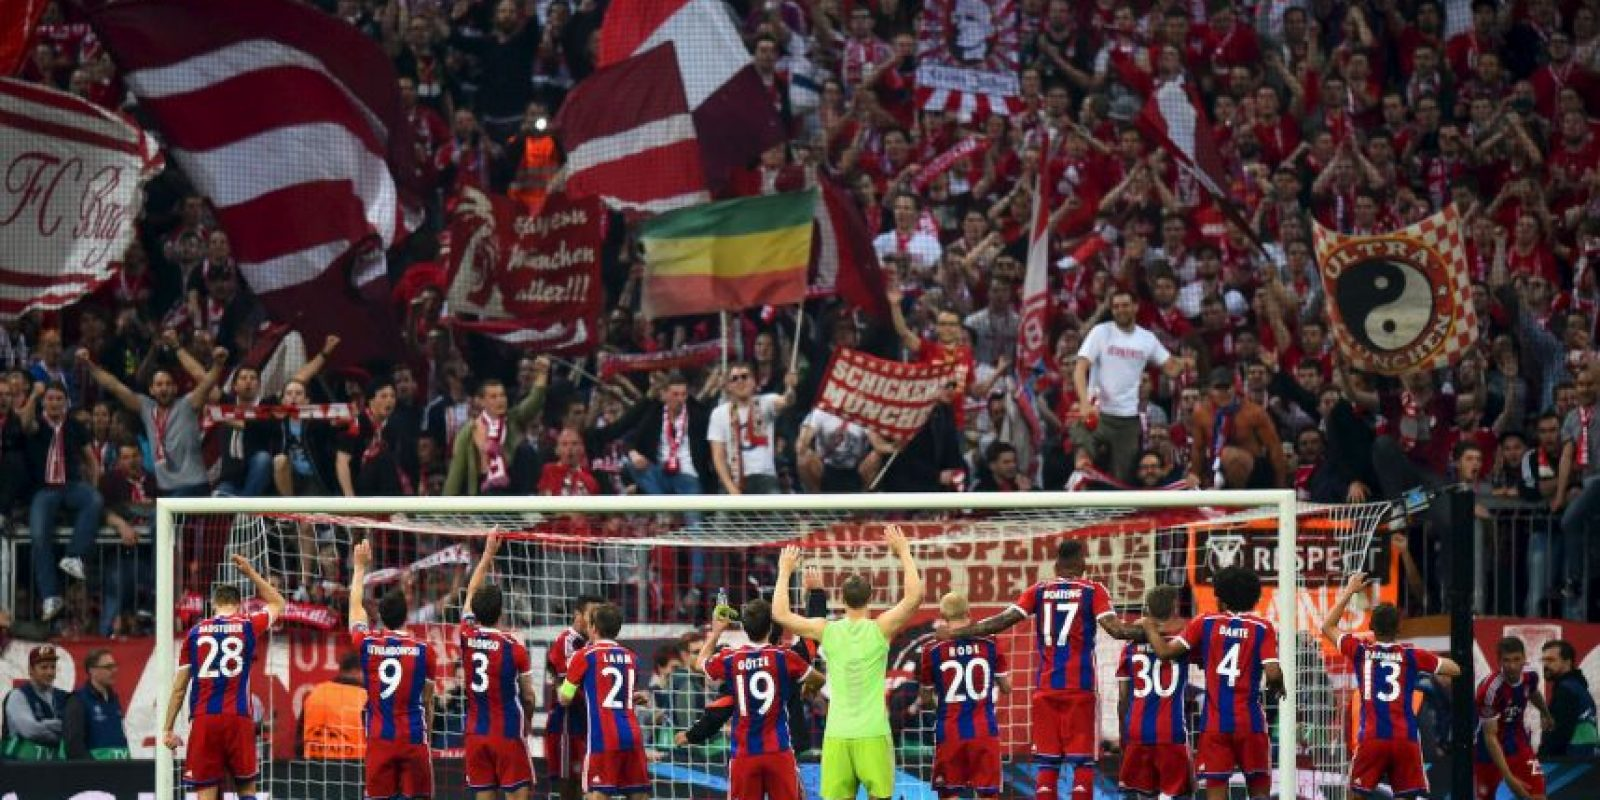 Los goles del Bayern fueron de Thiago Alcántara, Jerome Boateng, Robert Lewandowski (2), Thomas Müller y Xabi Alonso. Foto:Getty Images